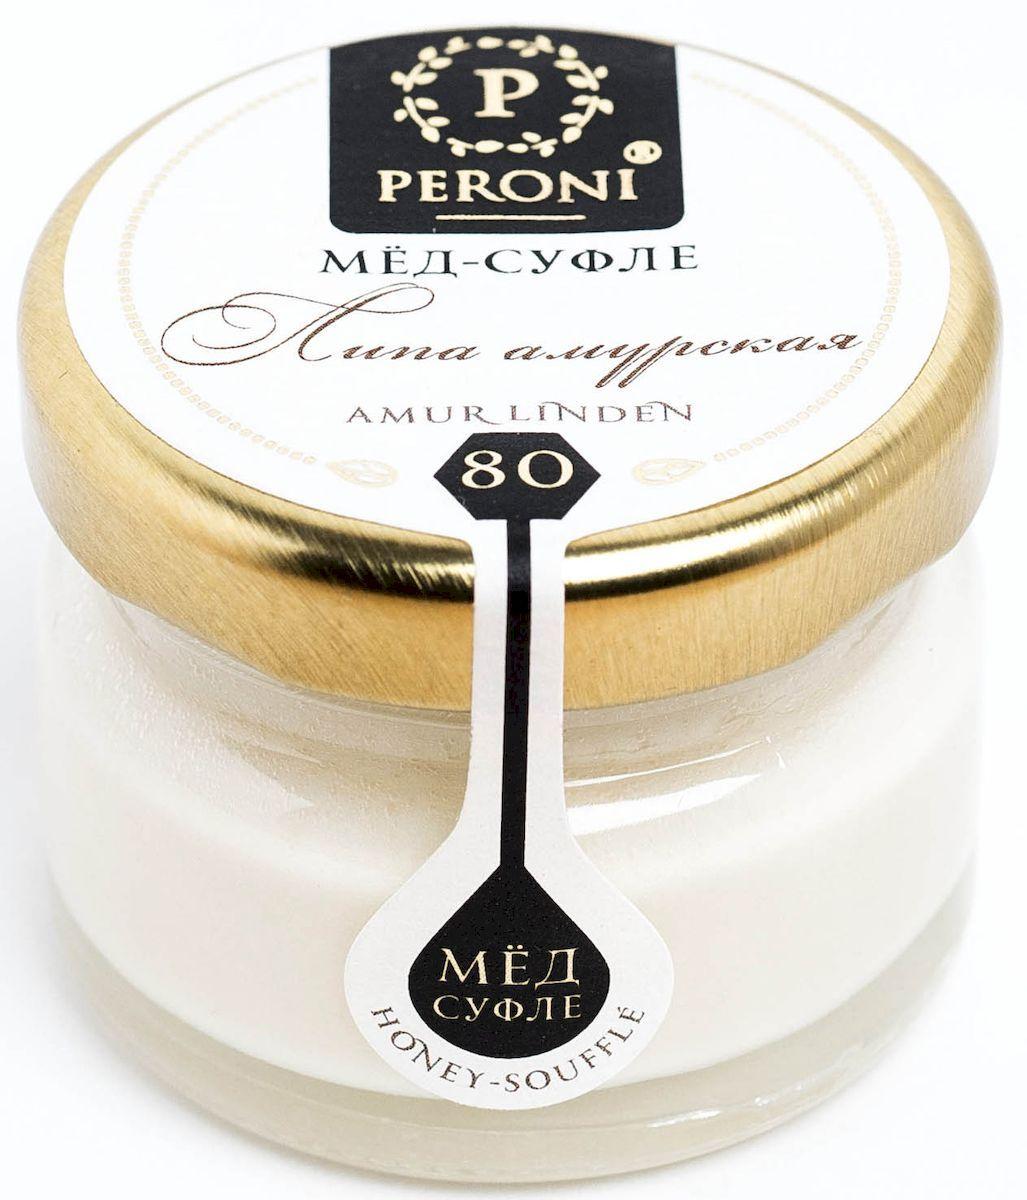 Peroni Липа амурская мед-суфле, 30 г peroni молочный цветок мед суфле 30 г